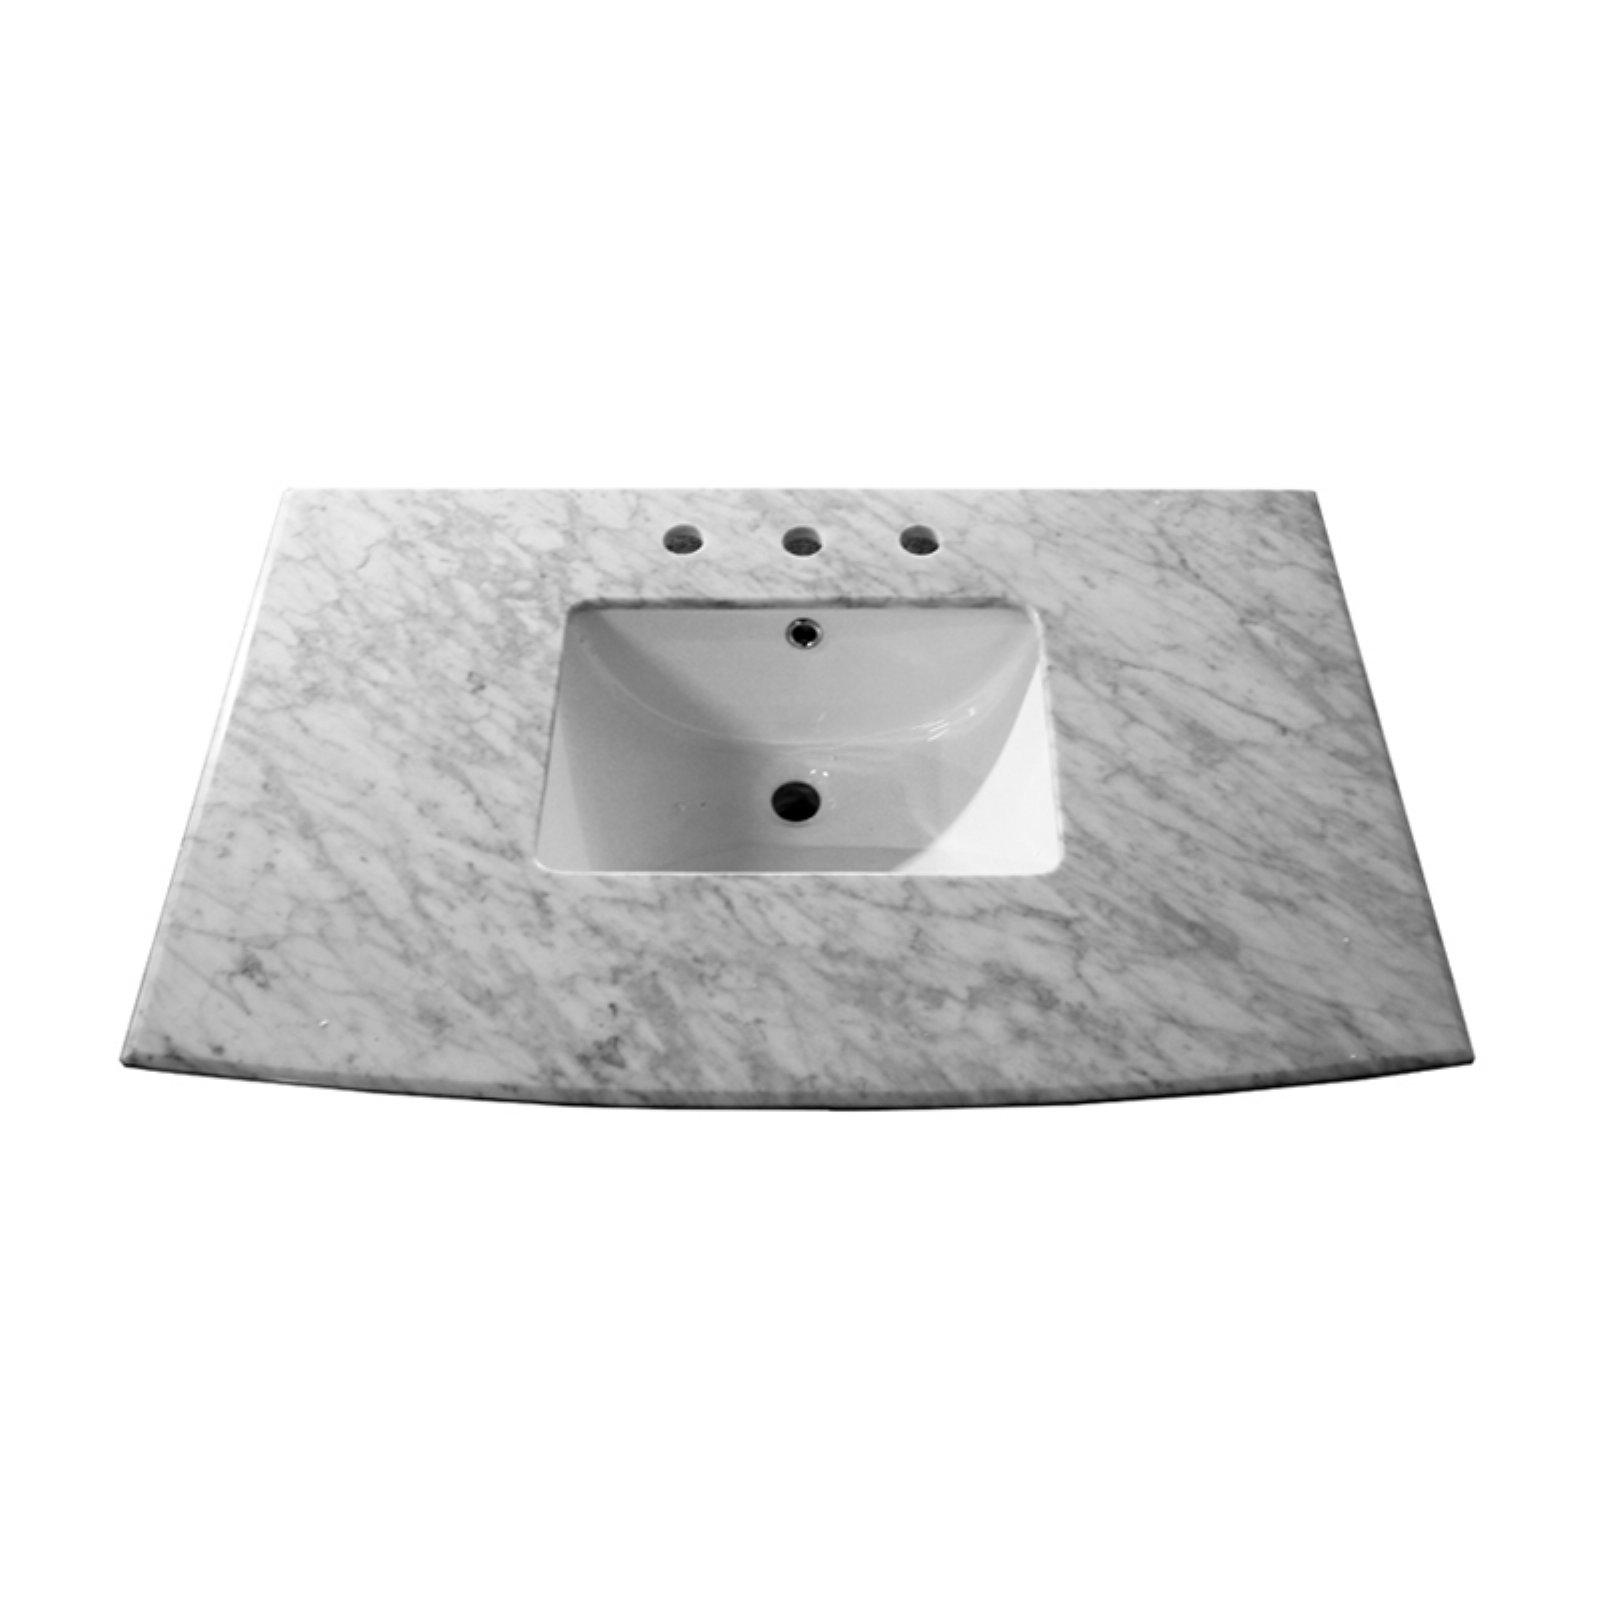 Bellaterra Home 36w X 228d In Carrara Marble Vanity Top With Sink